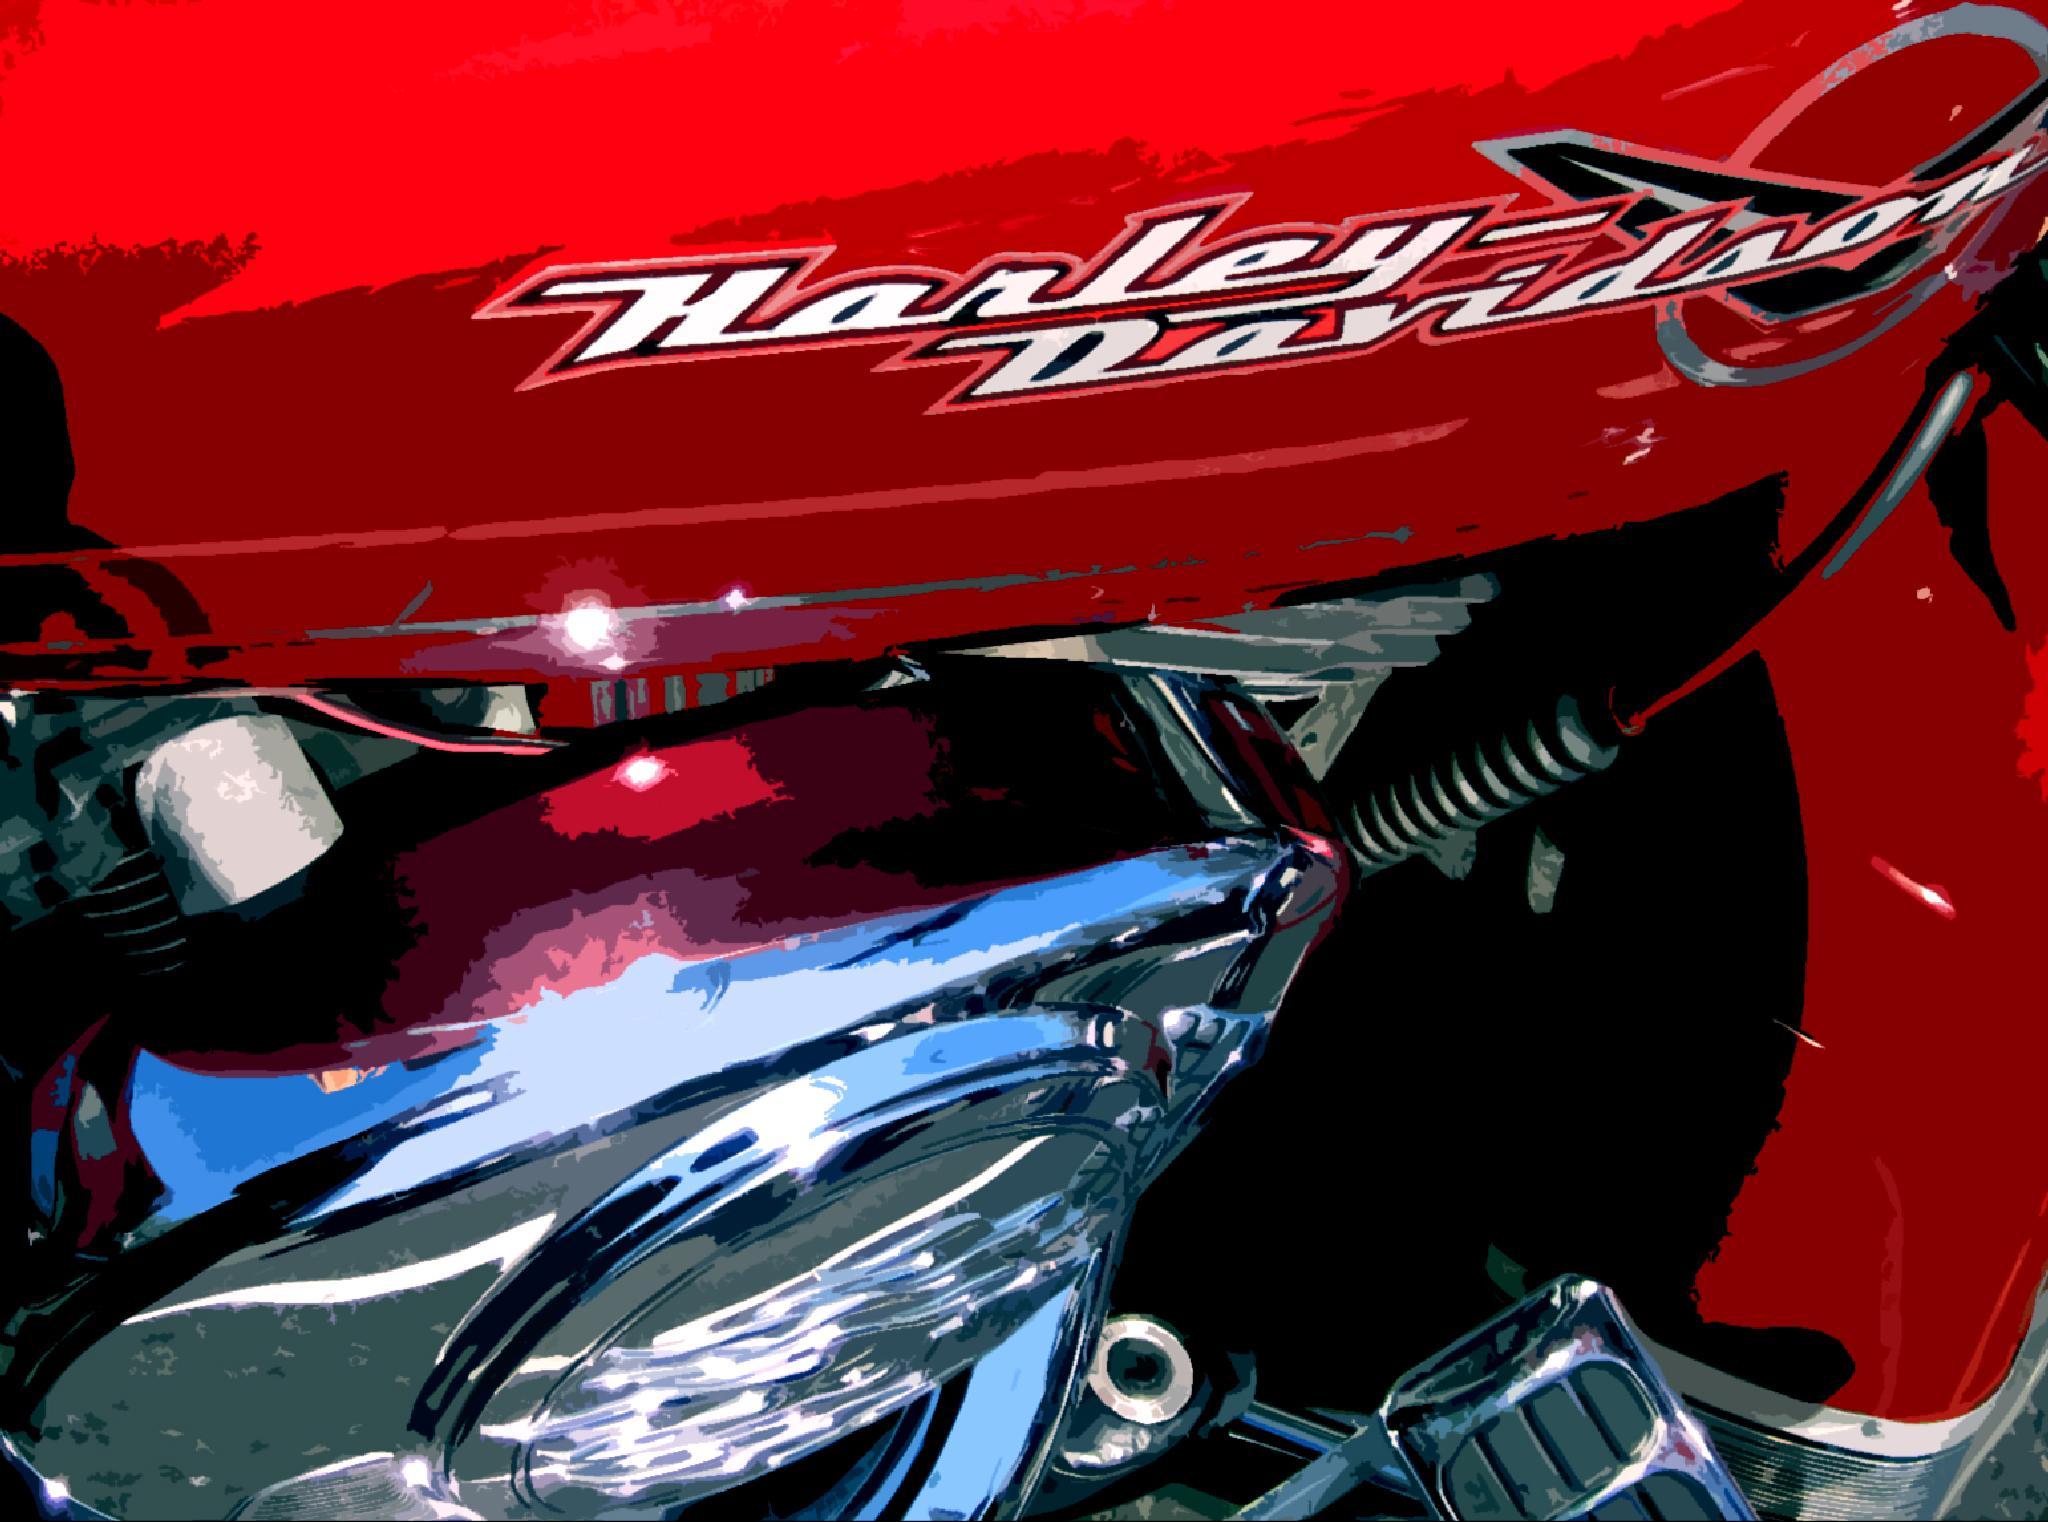 Harley Davidson Red by Stumbelina's CustomArt